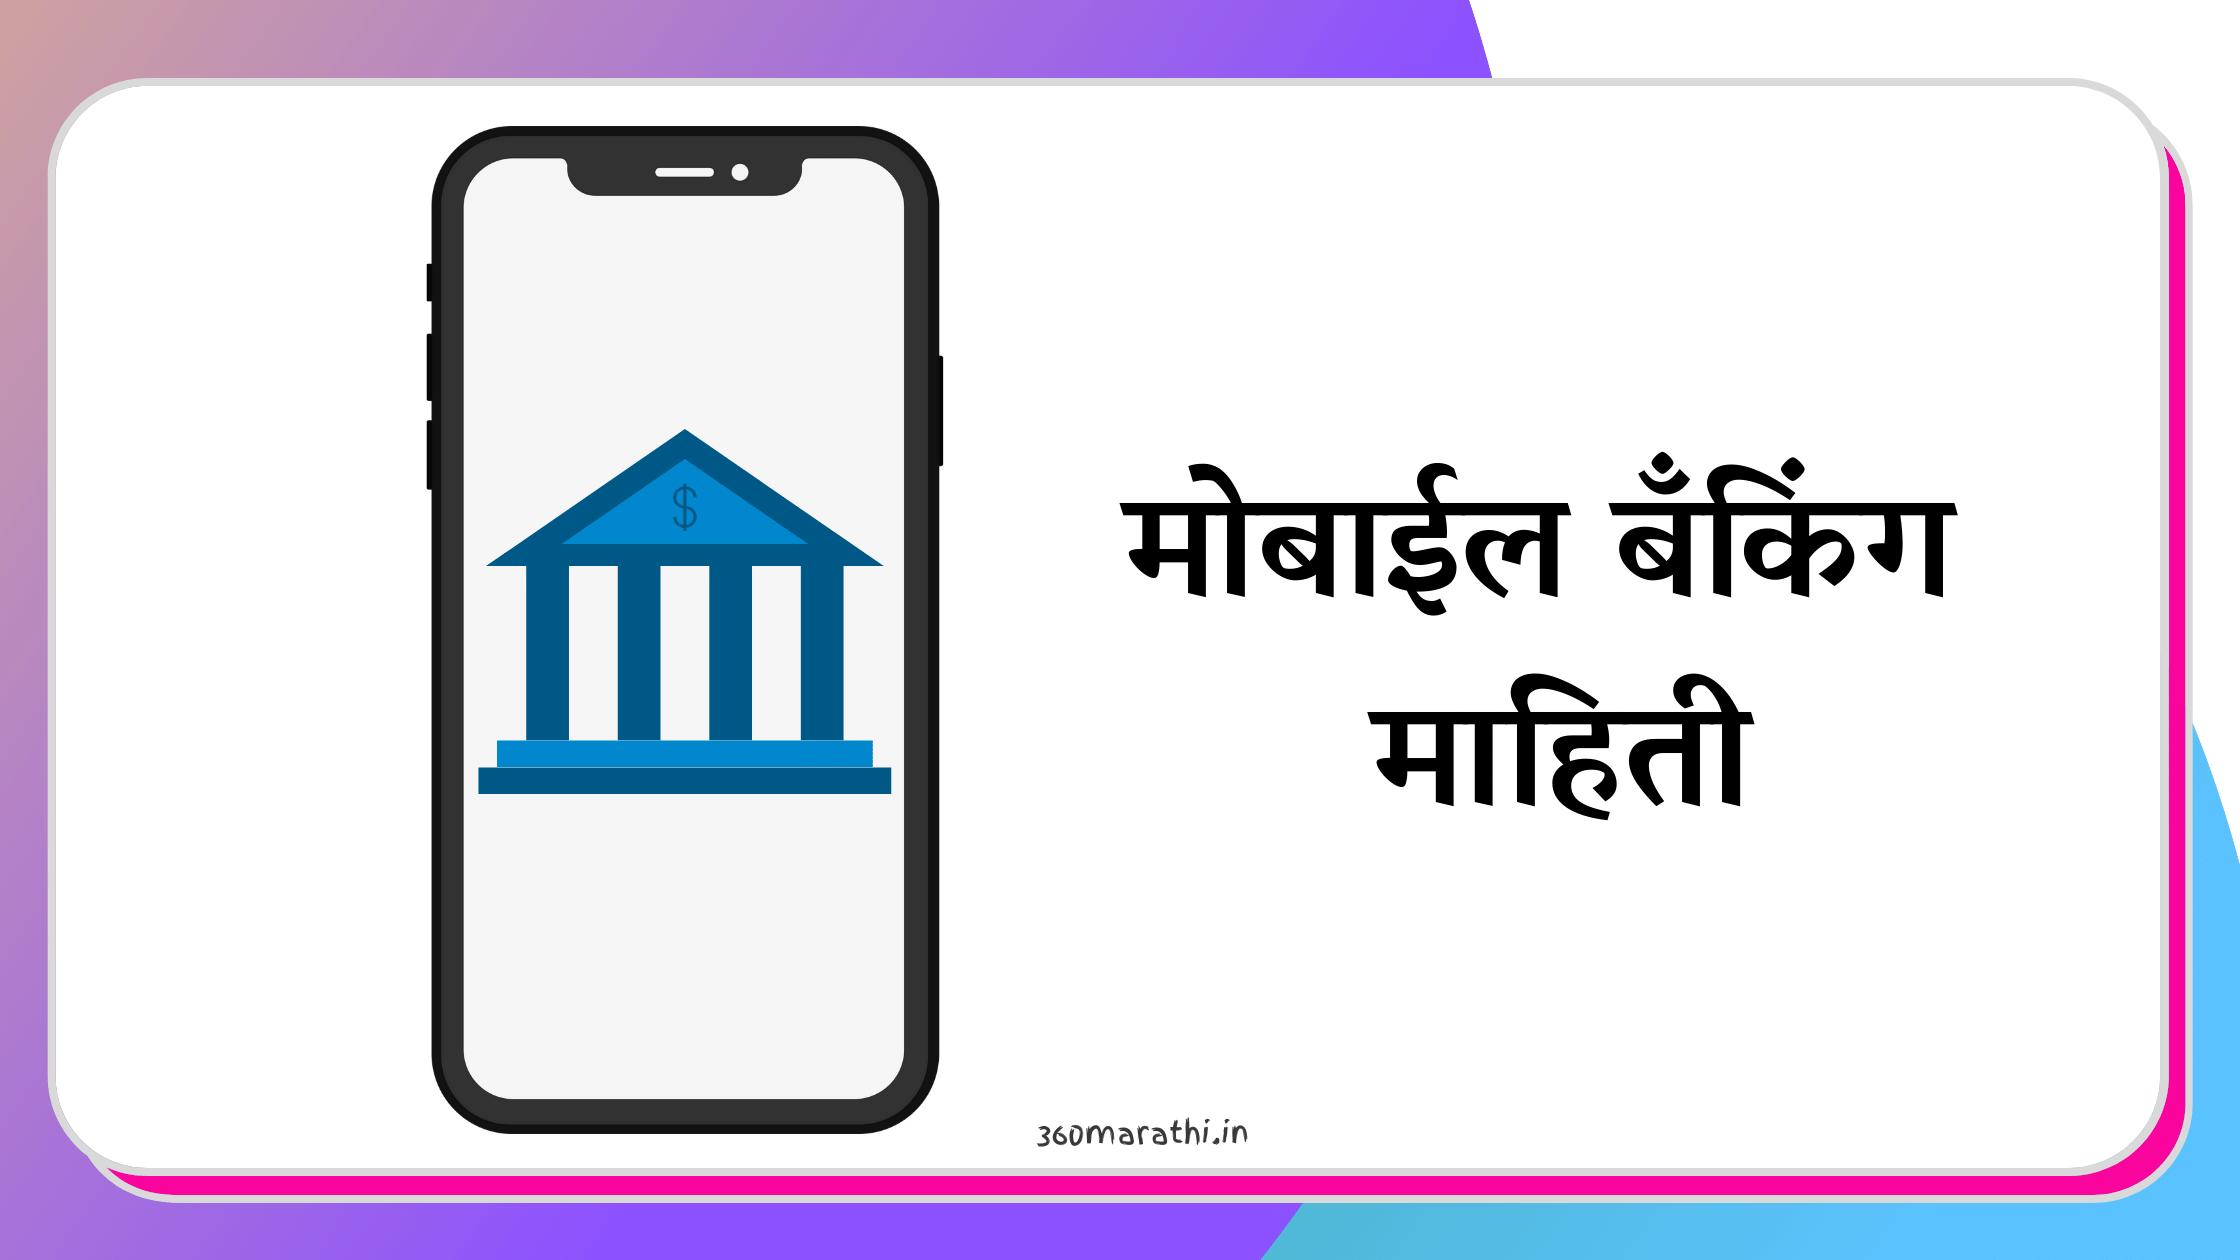 मोबाईल बँकिंग माहिती   Mobile banking in Marathi